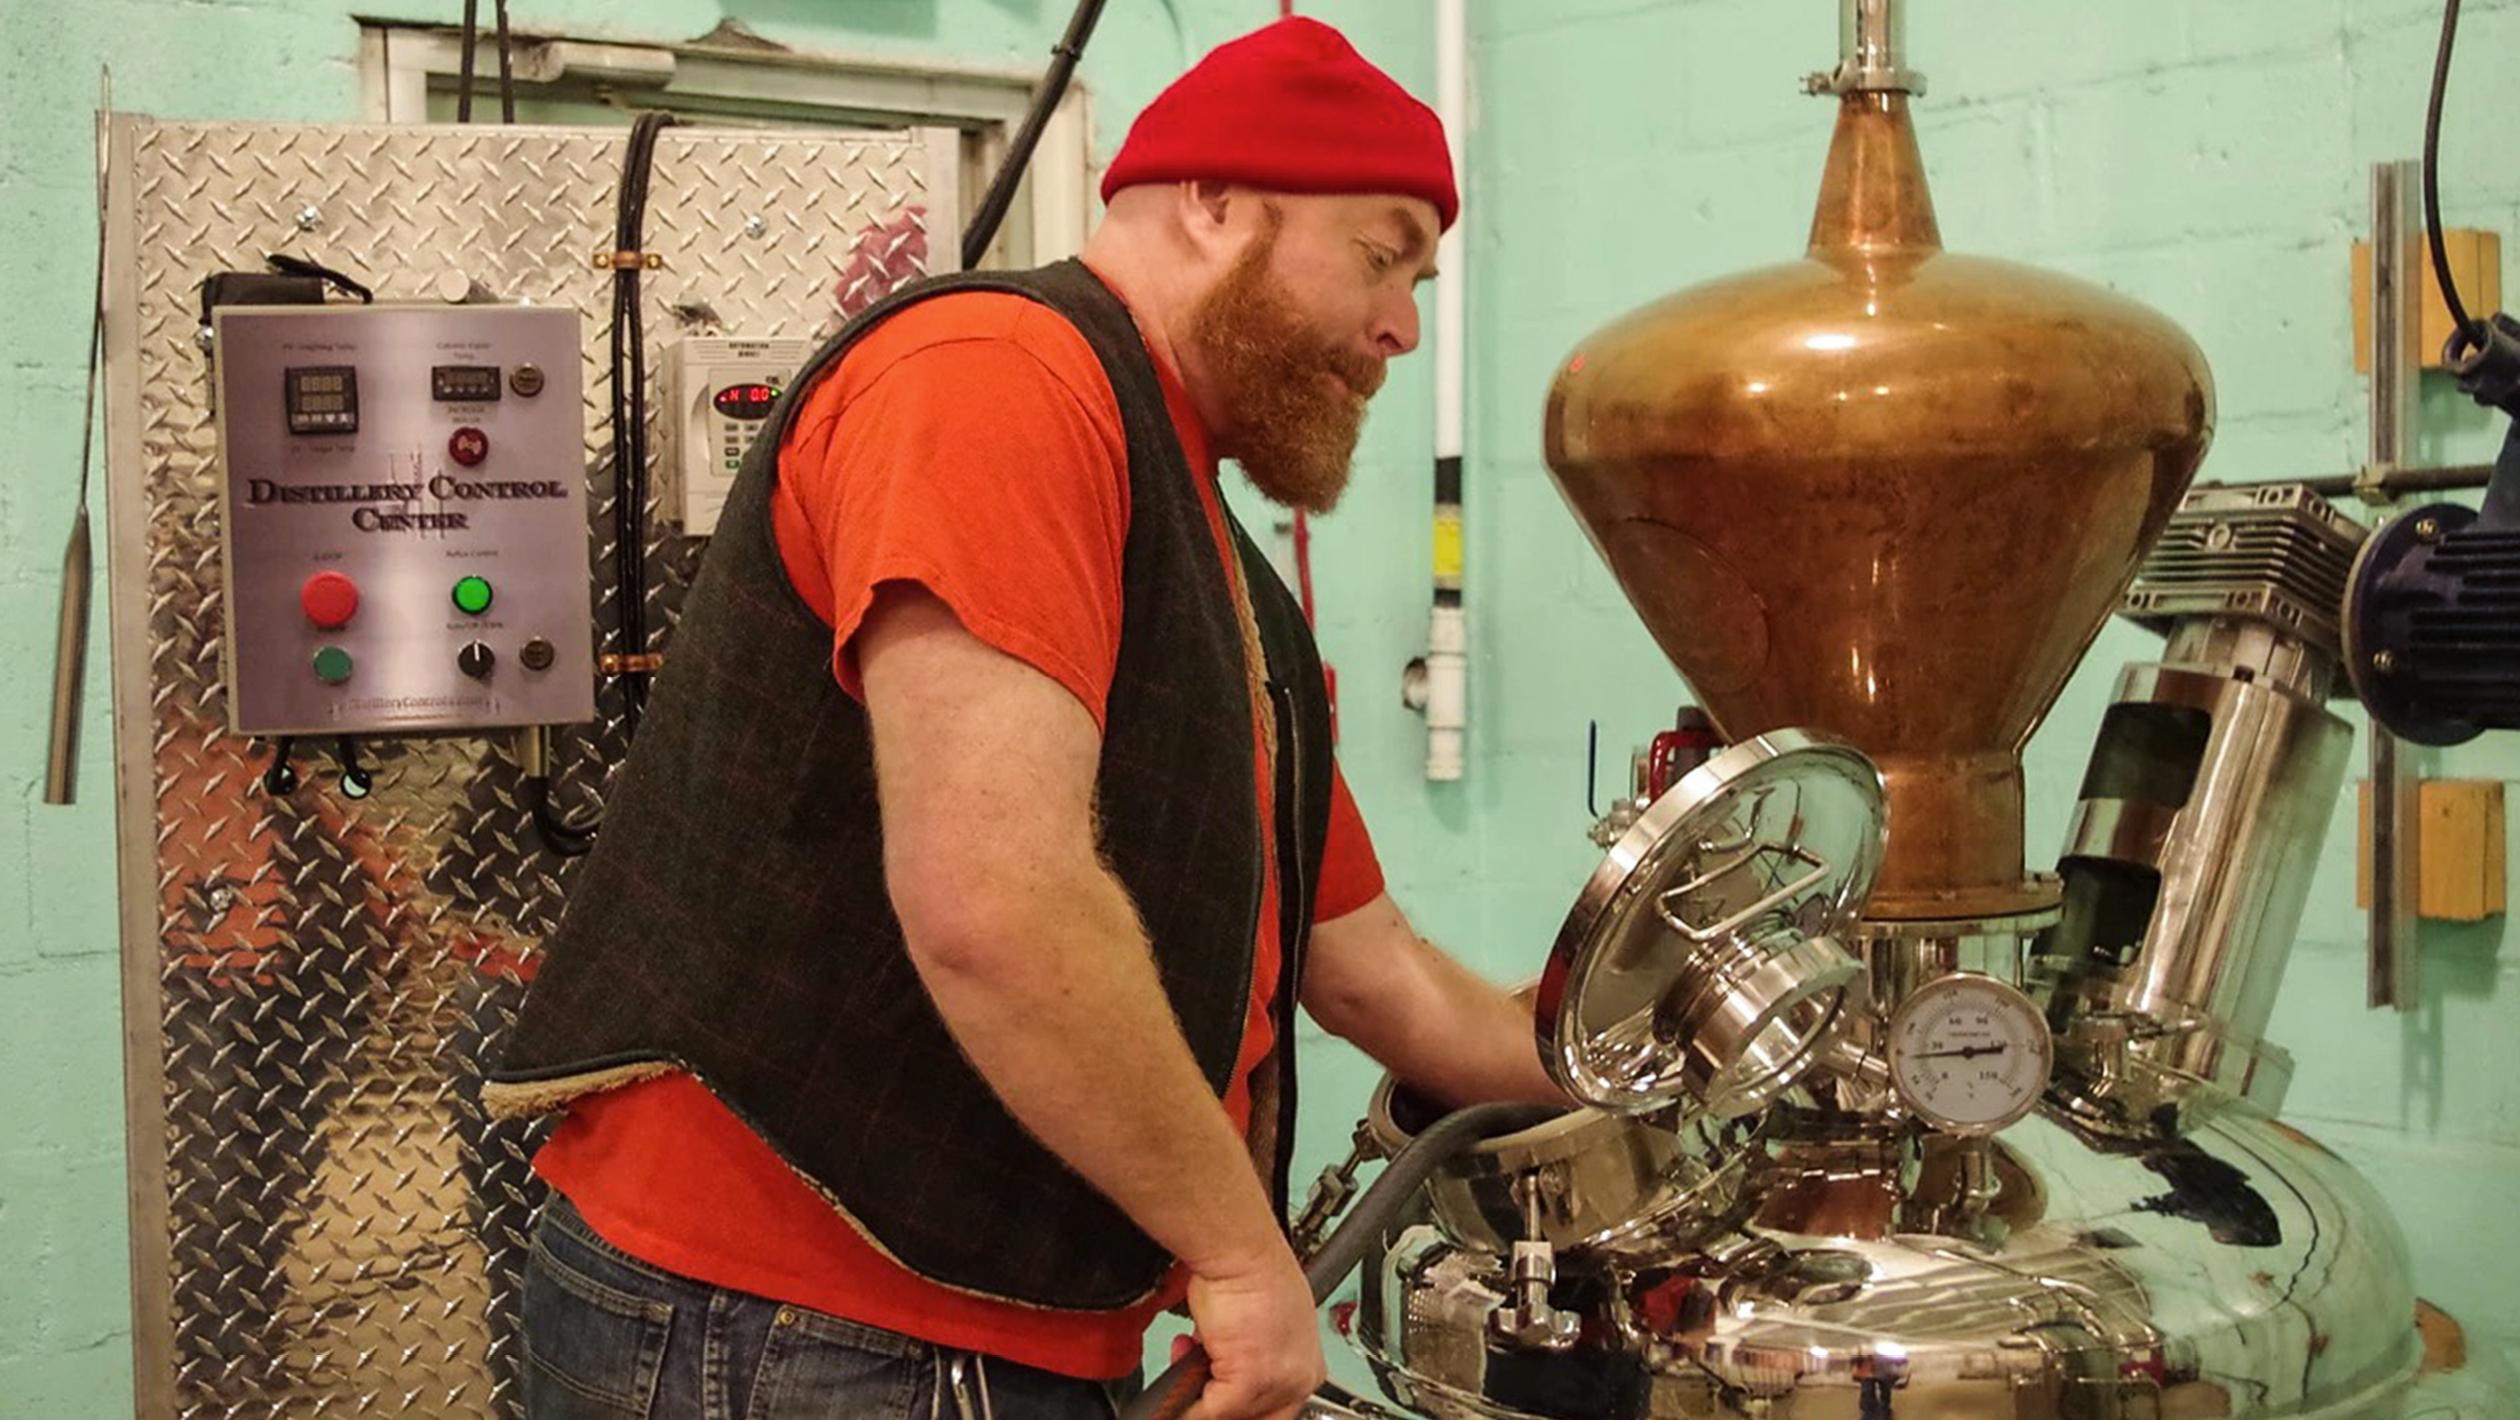 Master Distiller Dean Browne looking at stills